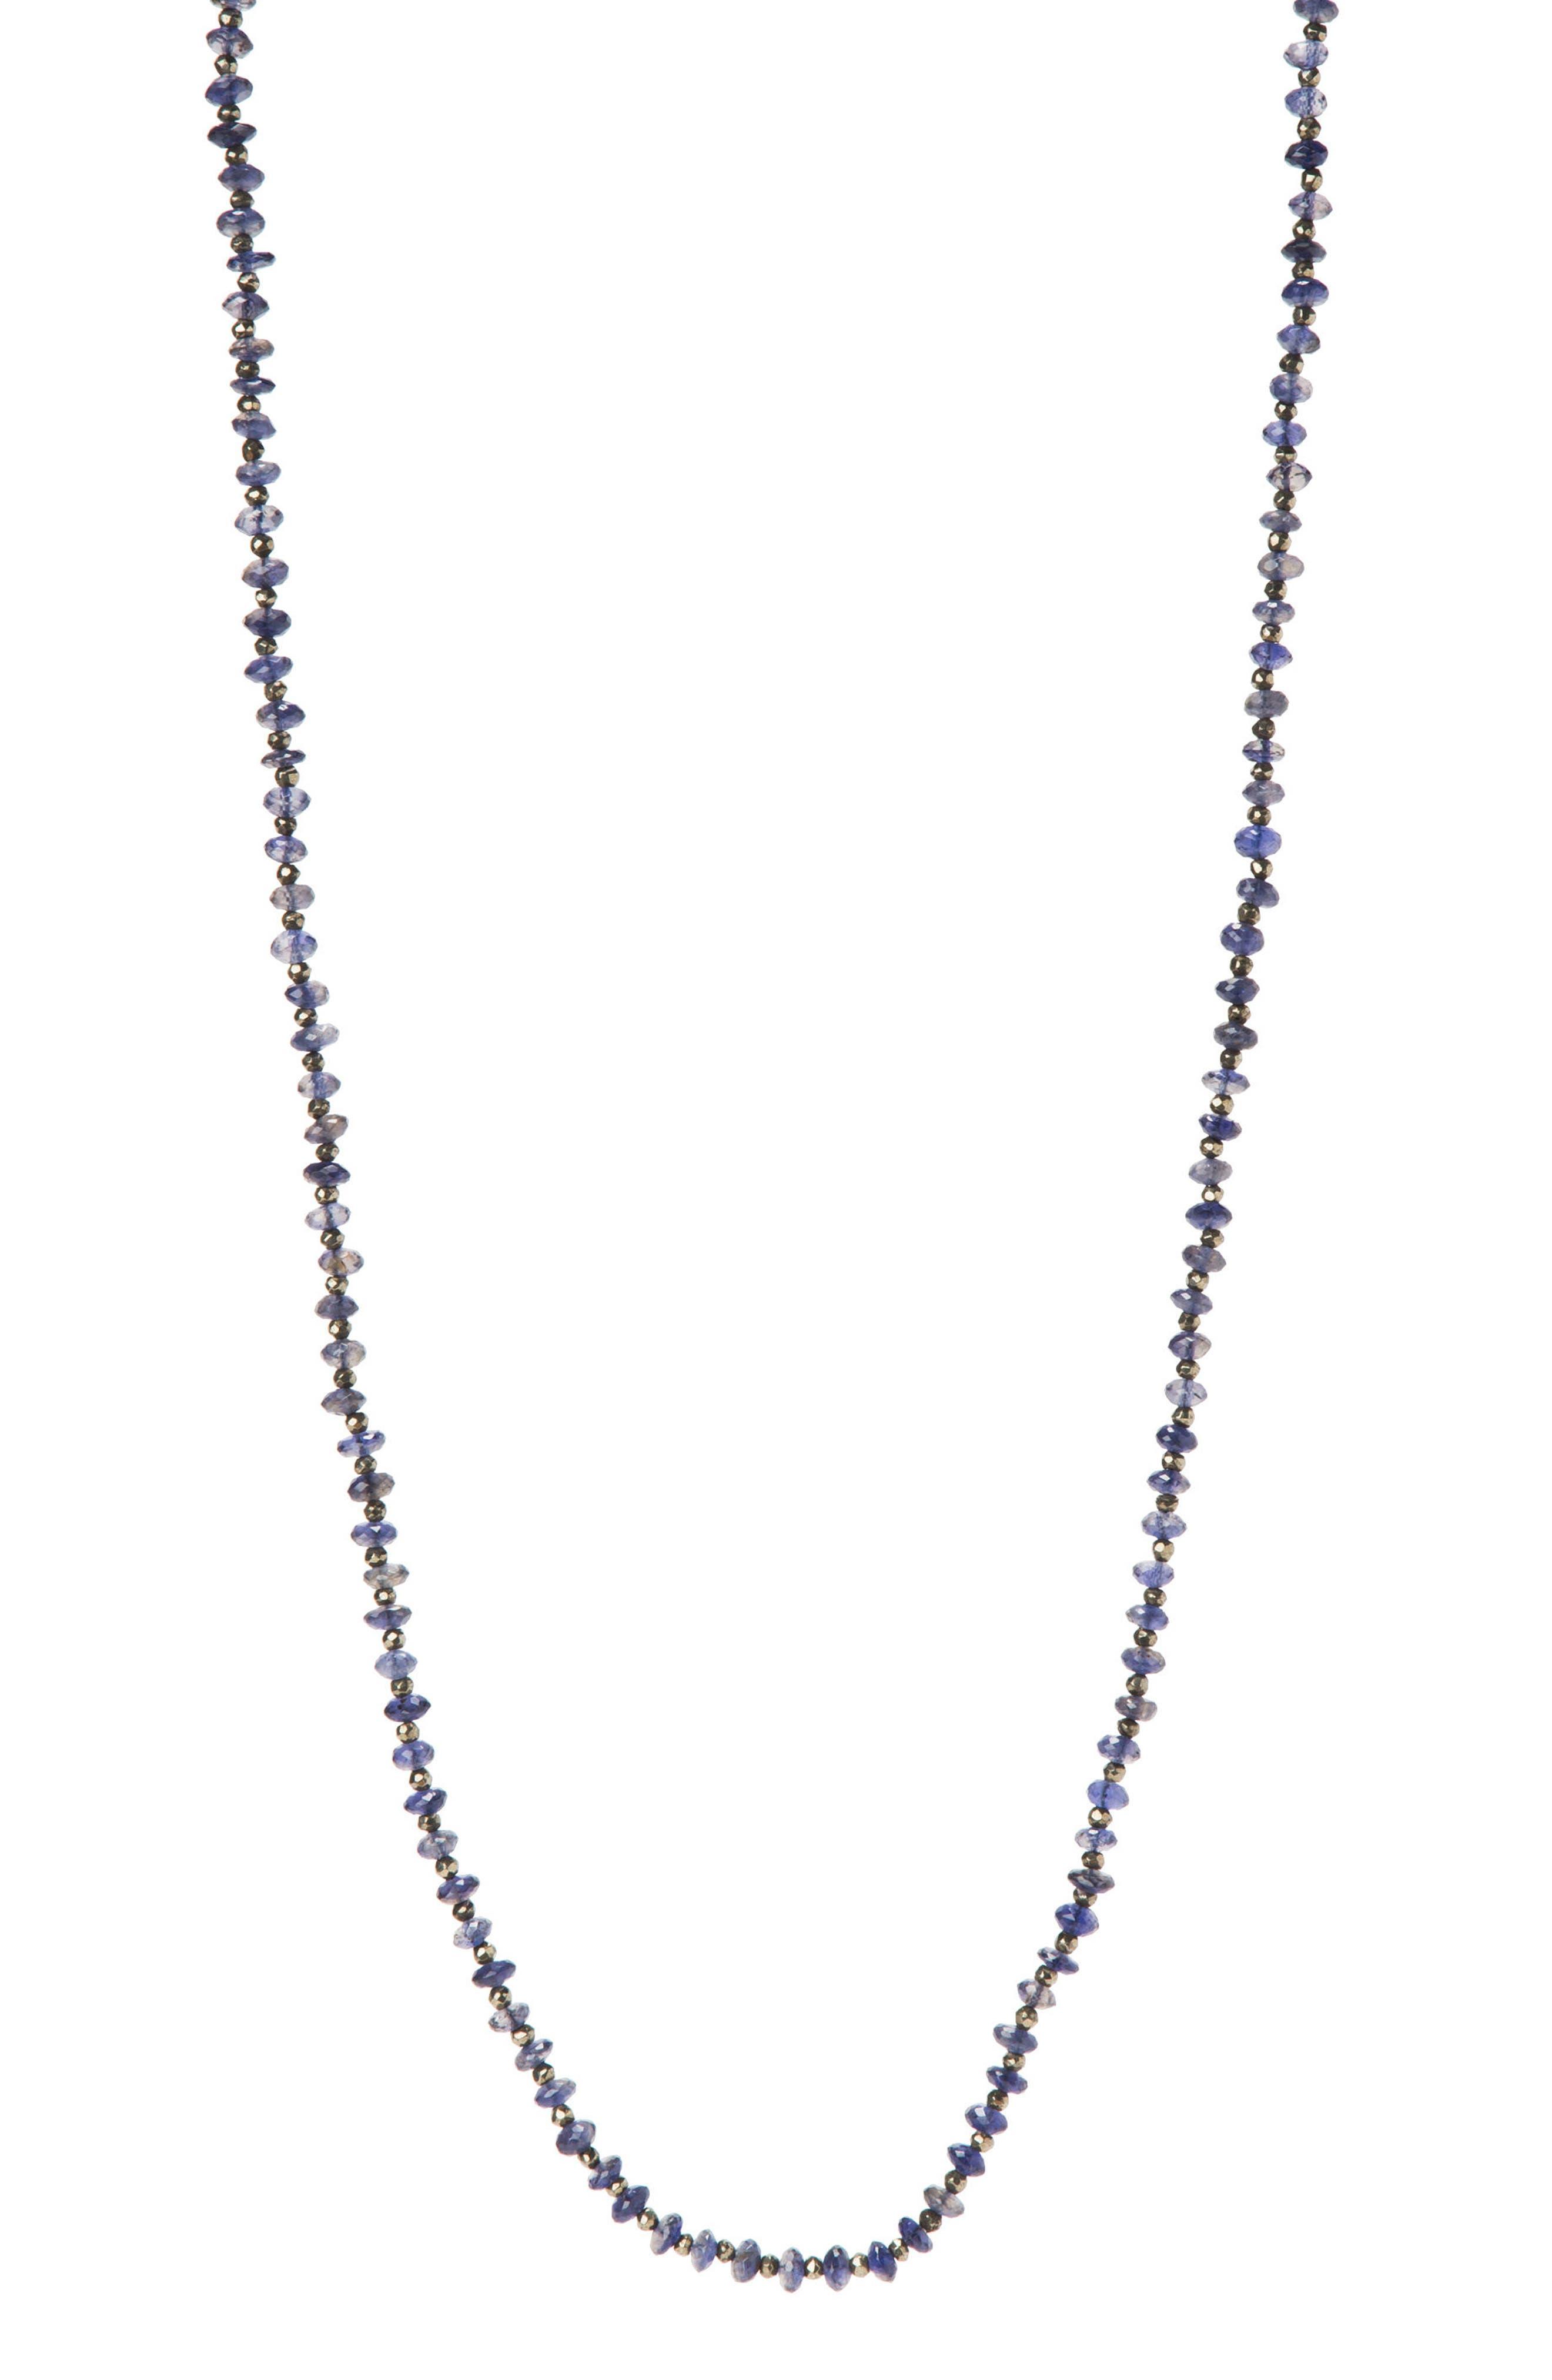 Solana Semiprecious Stone Necklace,                             Main thumbnail 1, color,                             IOLITE